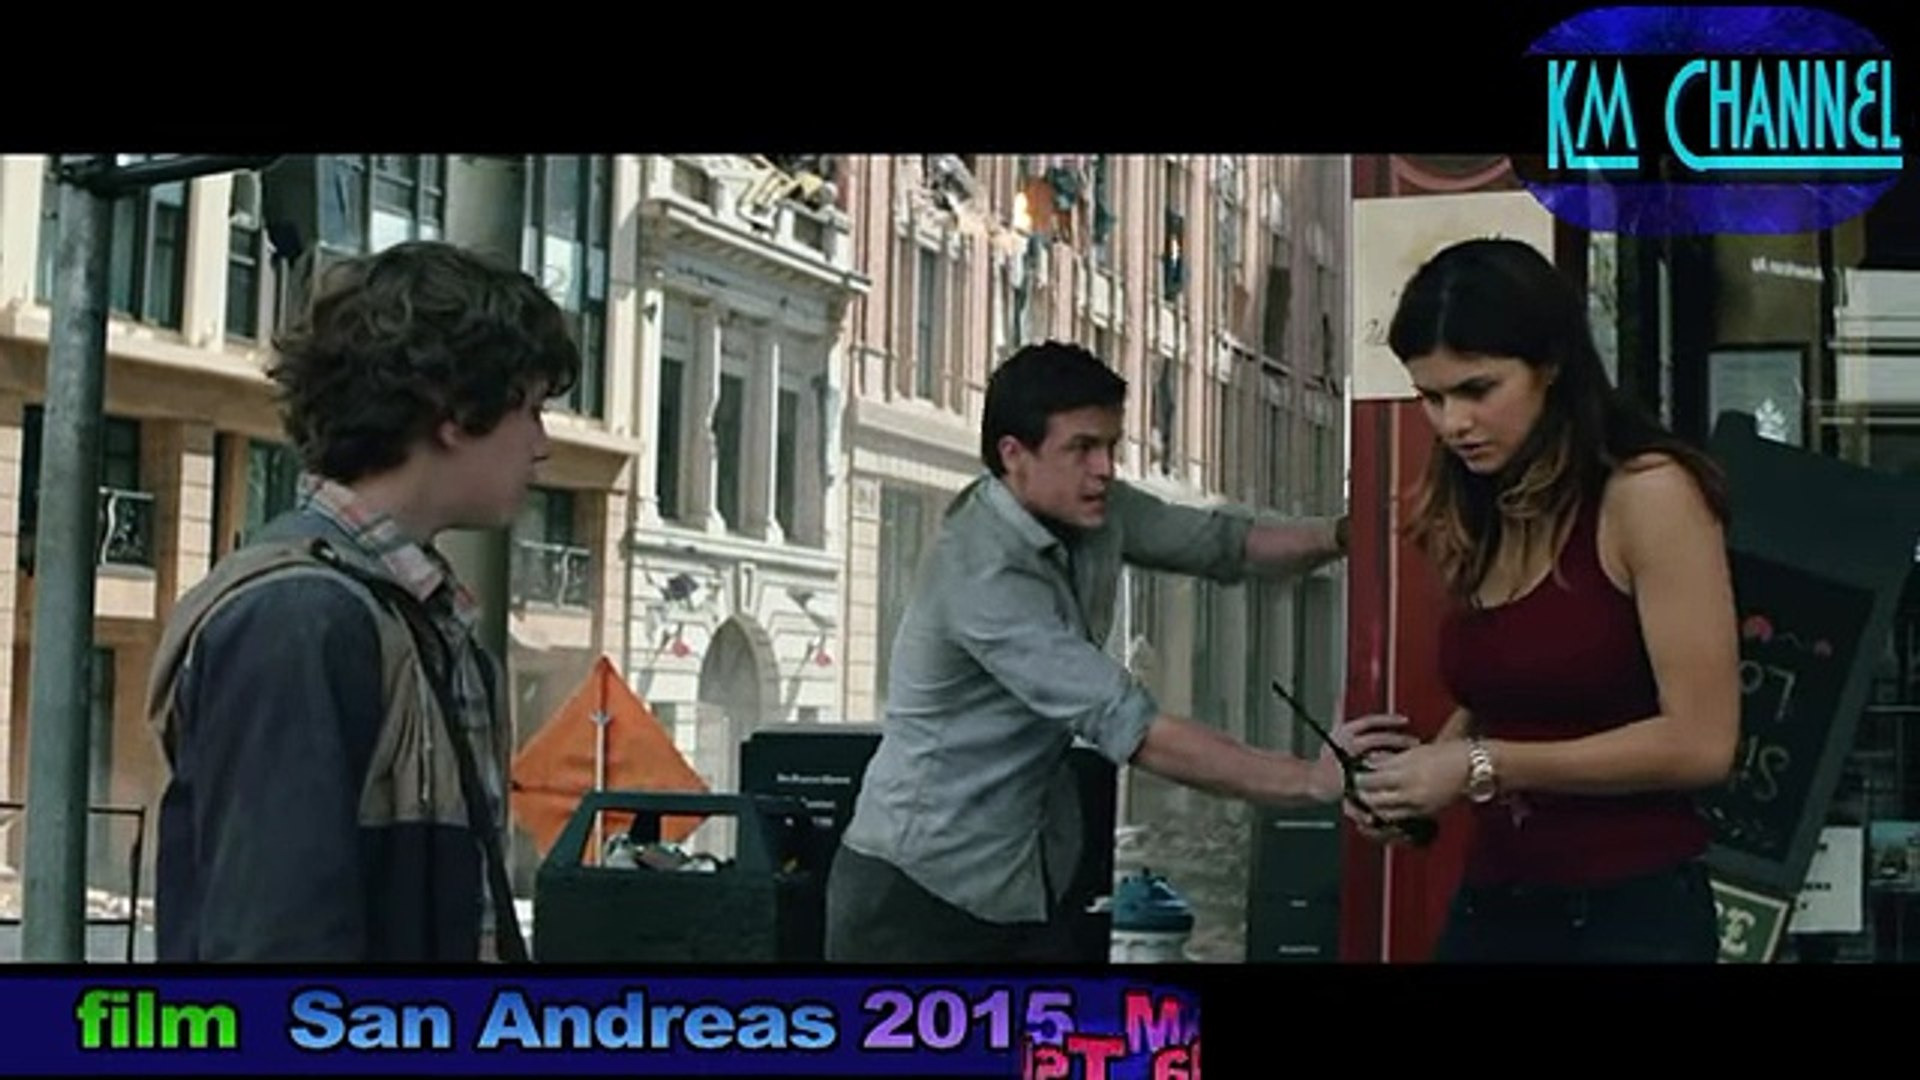 Mega Tsunami Scenes From The Film San Andreas 2015 Video Dailymotion